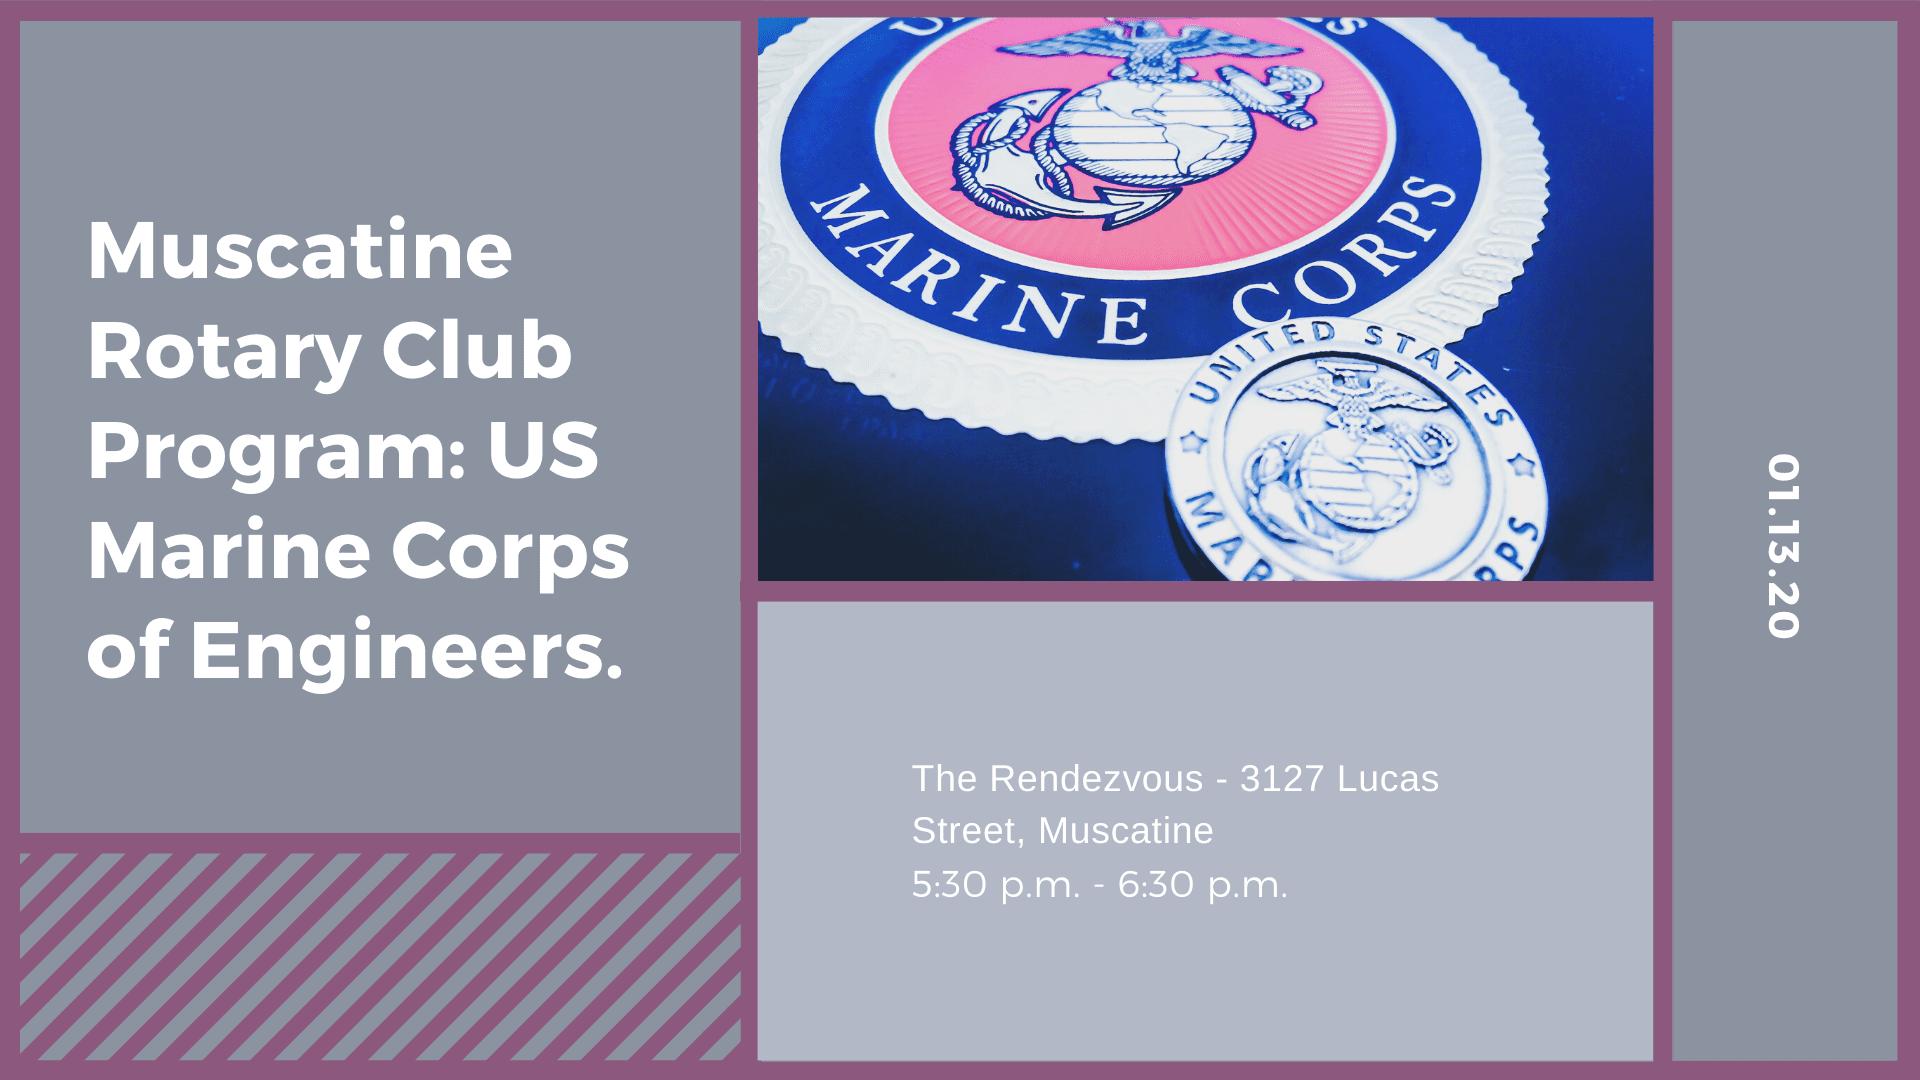 Muscatine Rotary Club Program: US Marine Corps of Engineers.